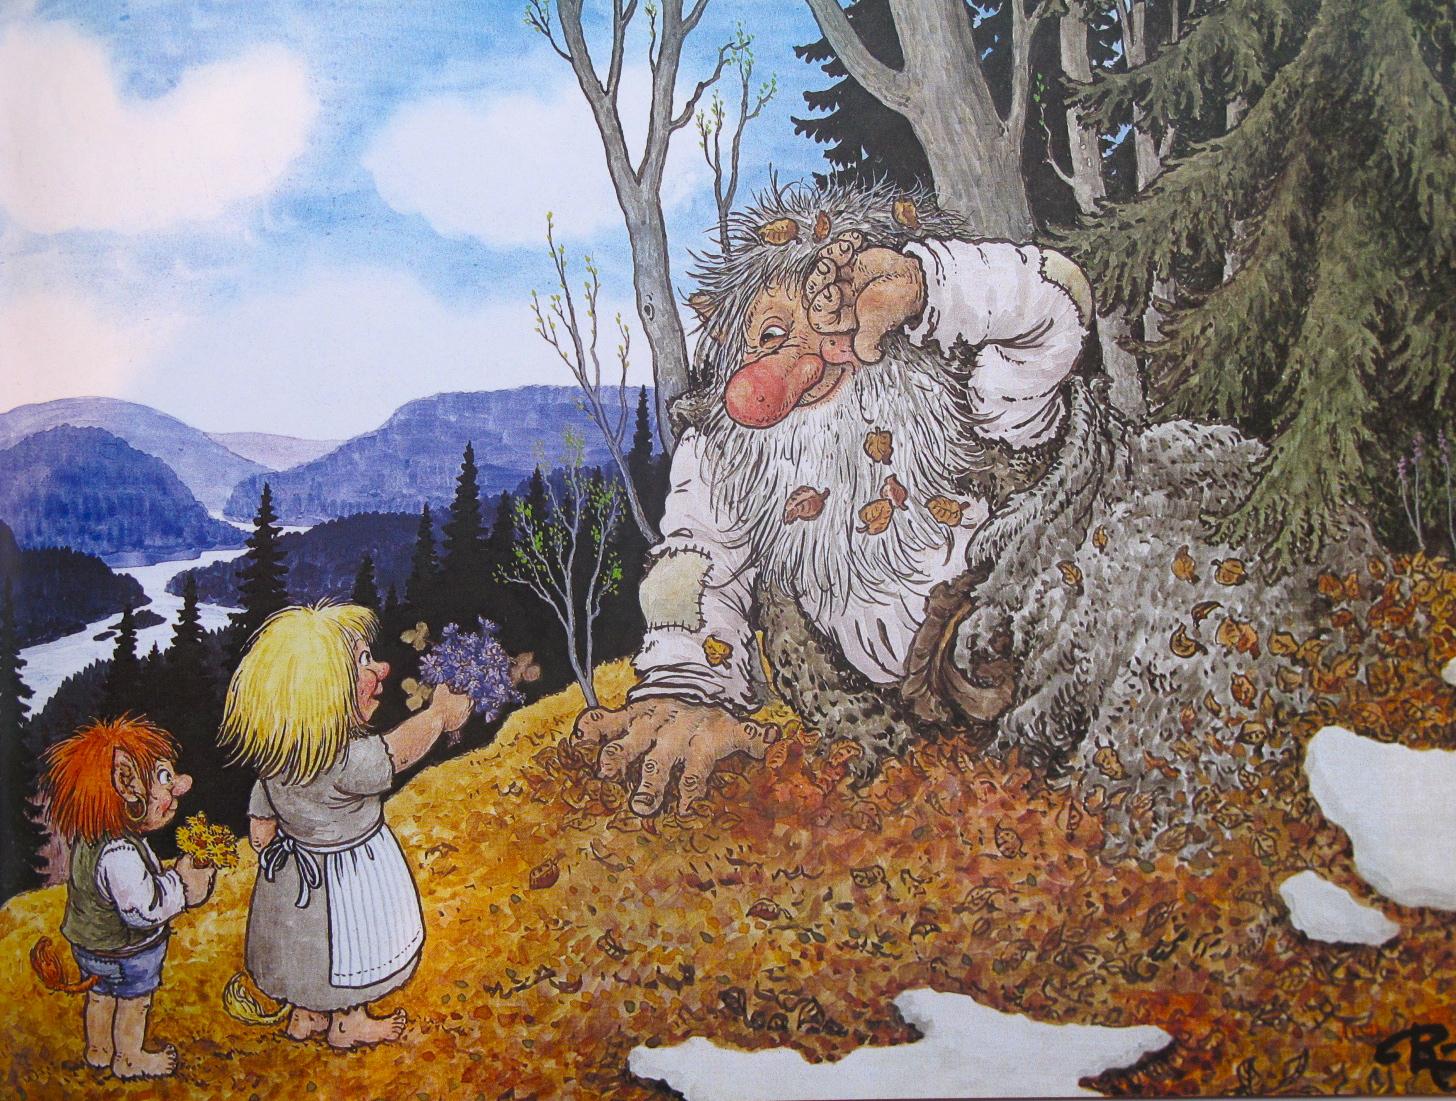 Emma Hill  Troll Illustrations By Rolf Lidberg